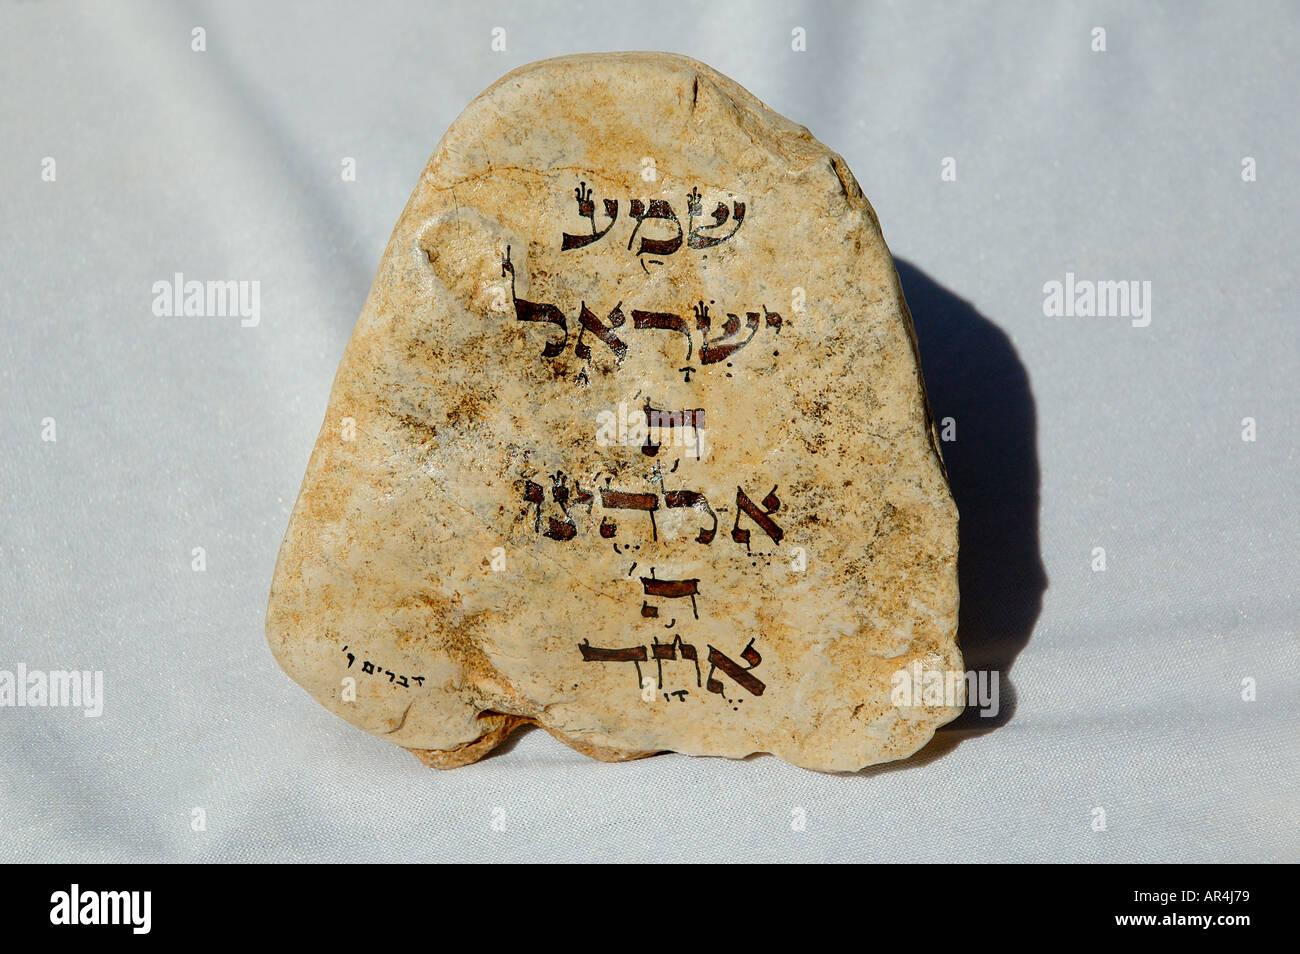 Biblical verse script in Hebrew language on stone - Stock Image